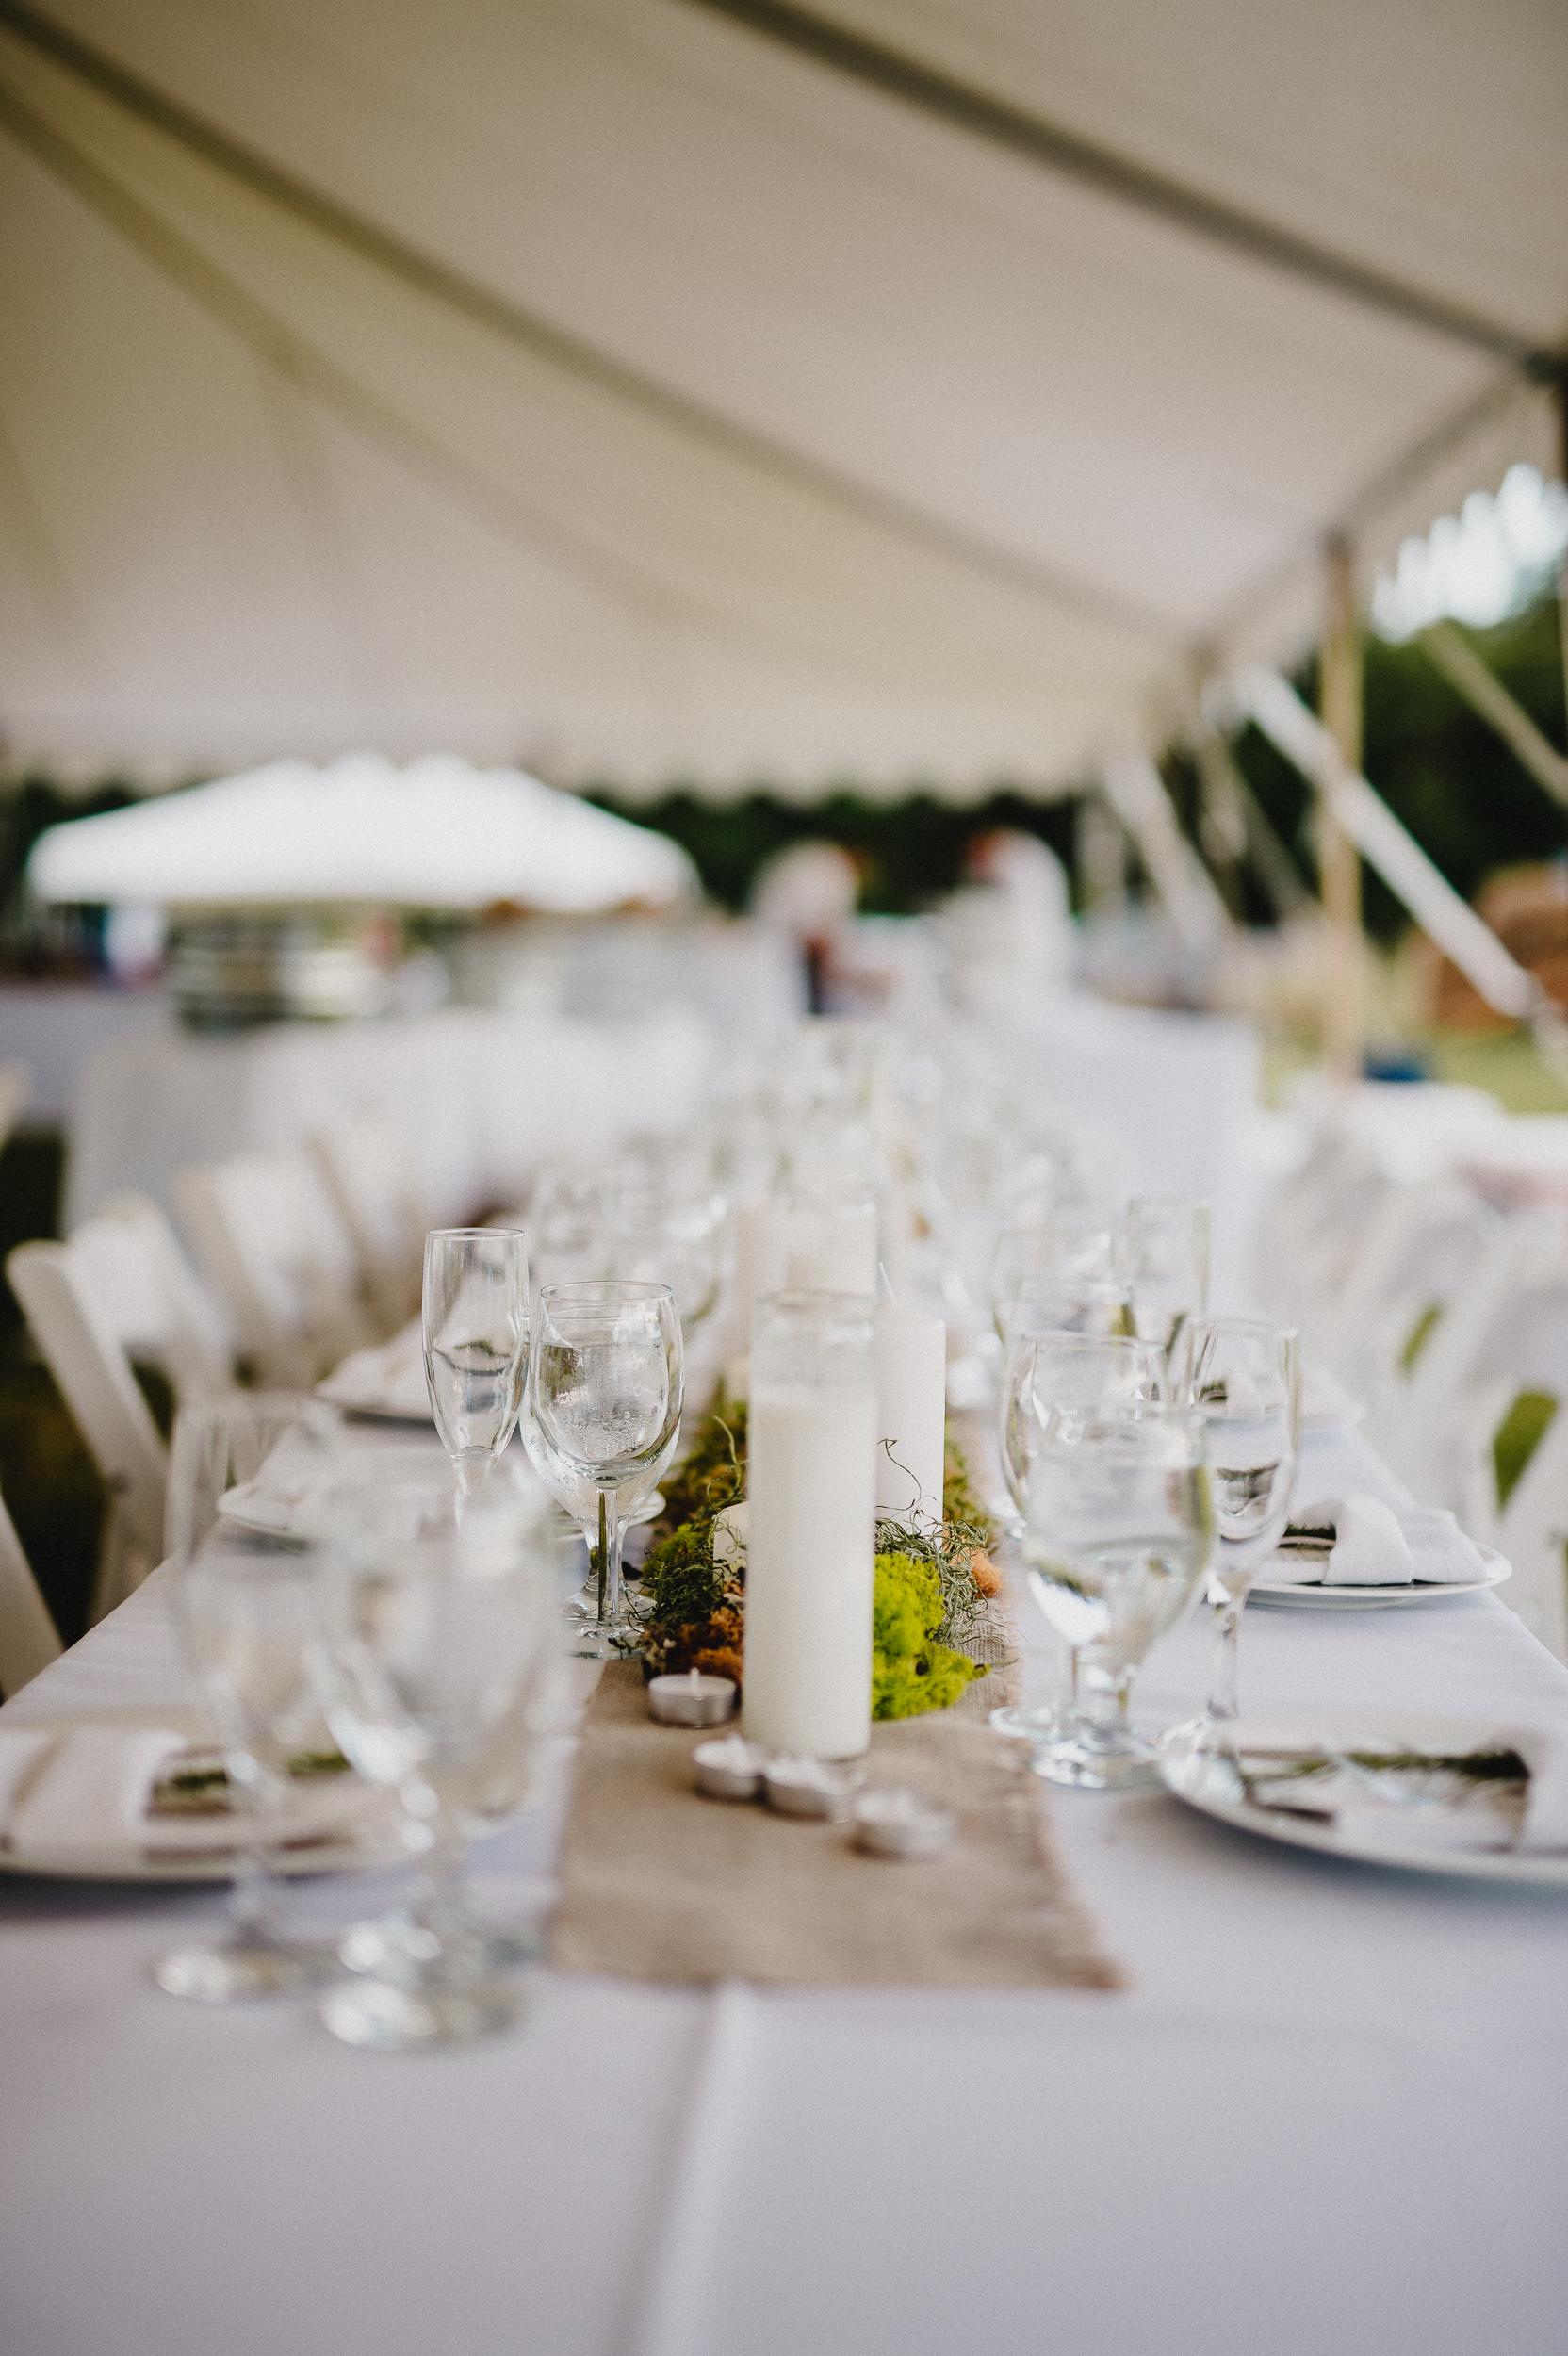 Pioneer-farms-warwick-new-york-wedding-photographer076.jpg